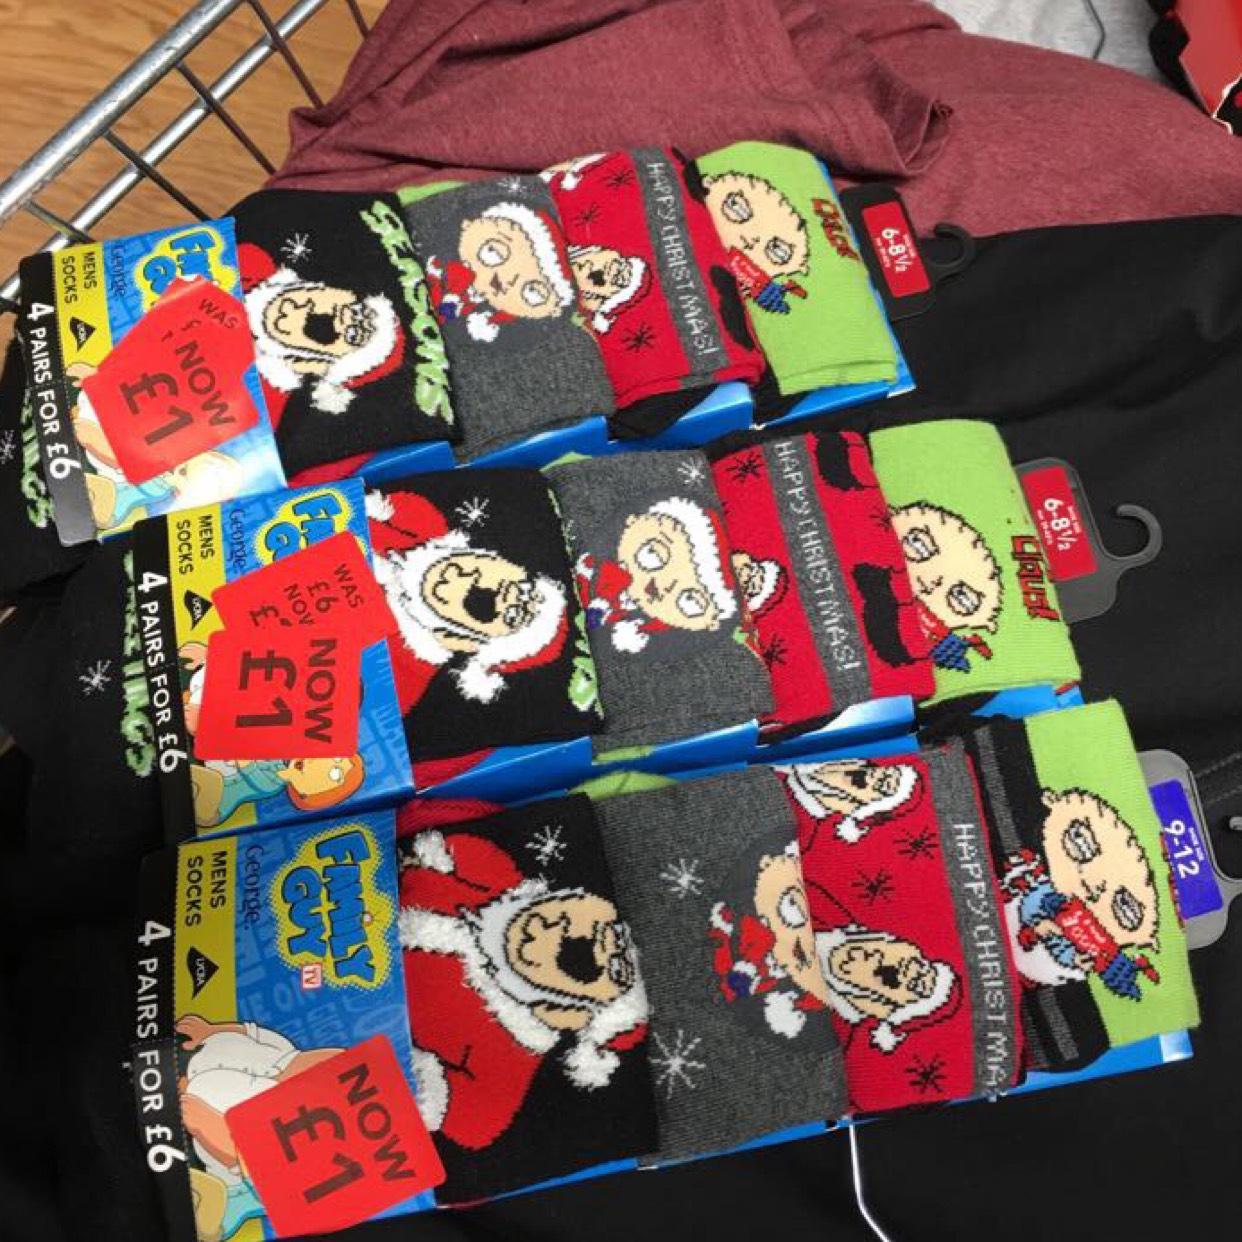 Asda 4 pairs men socks was £6 now reduced to £1 (25p per pair)